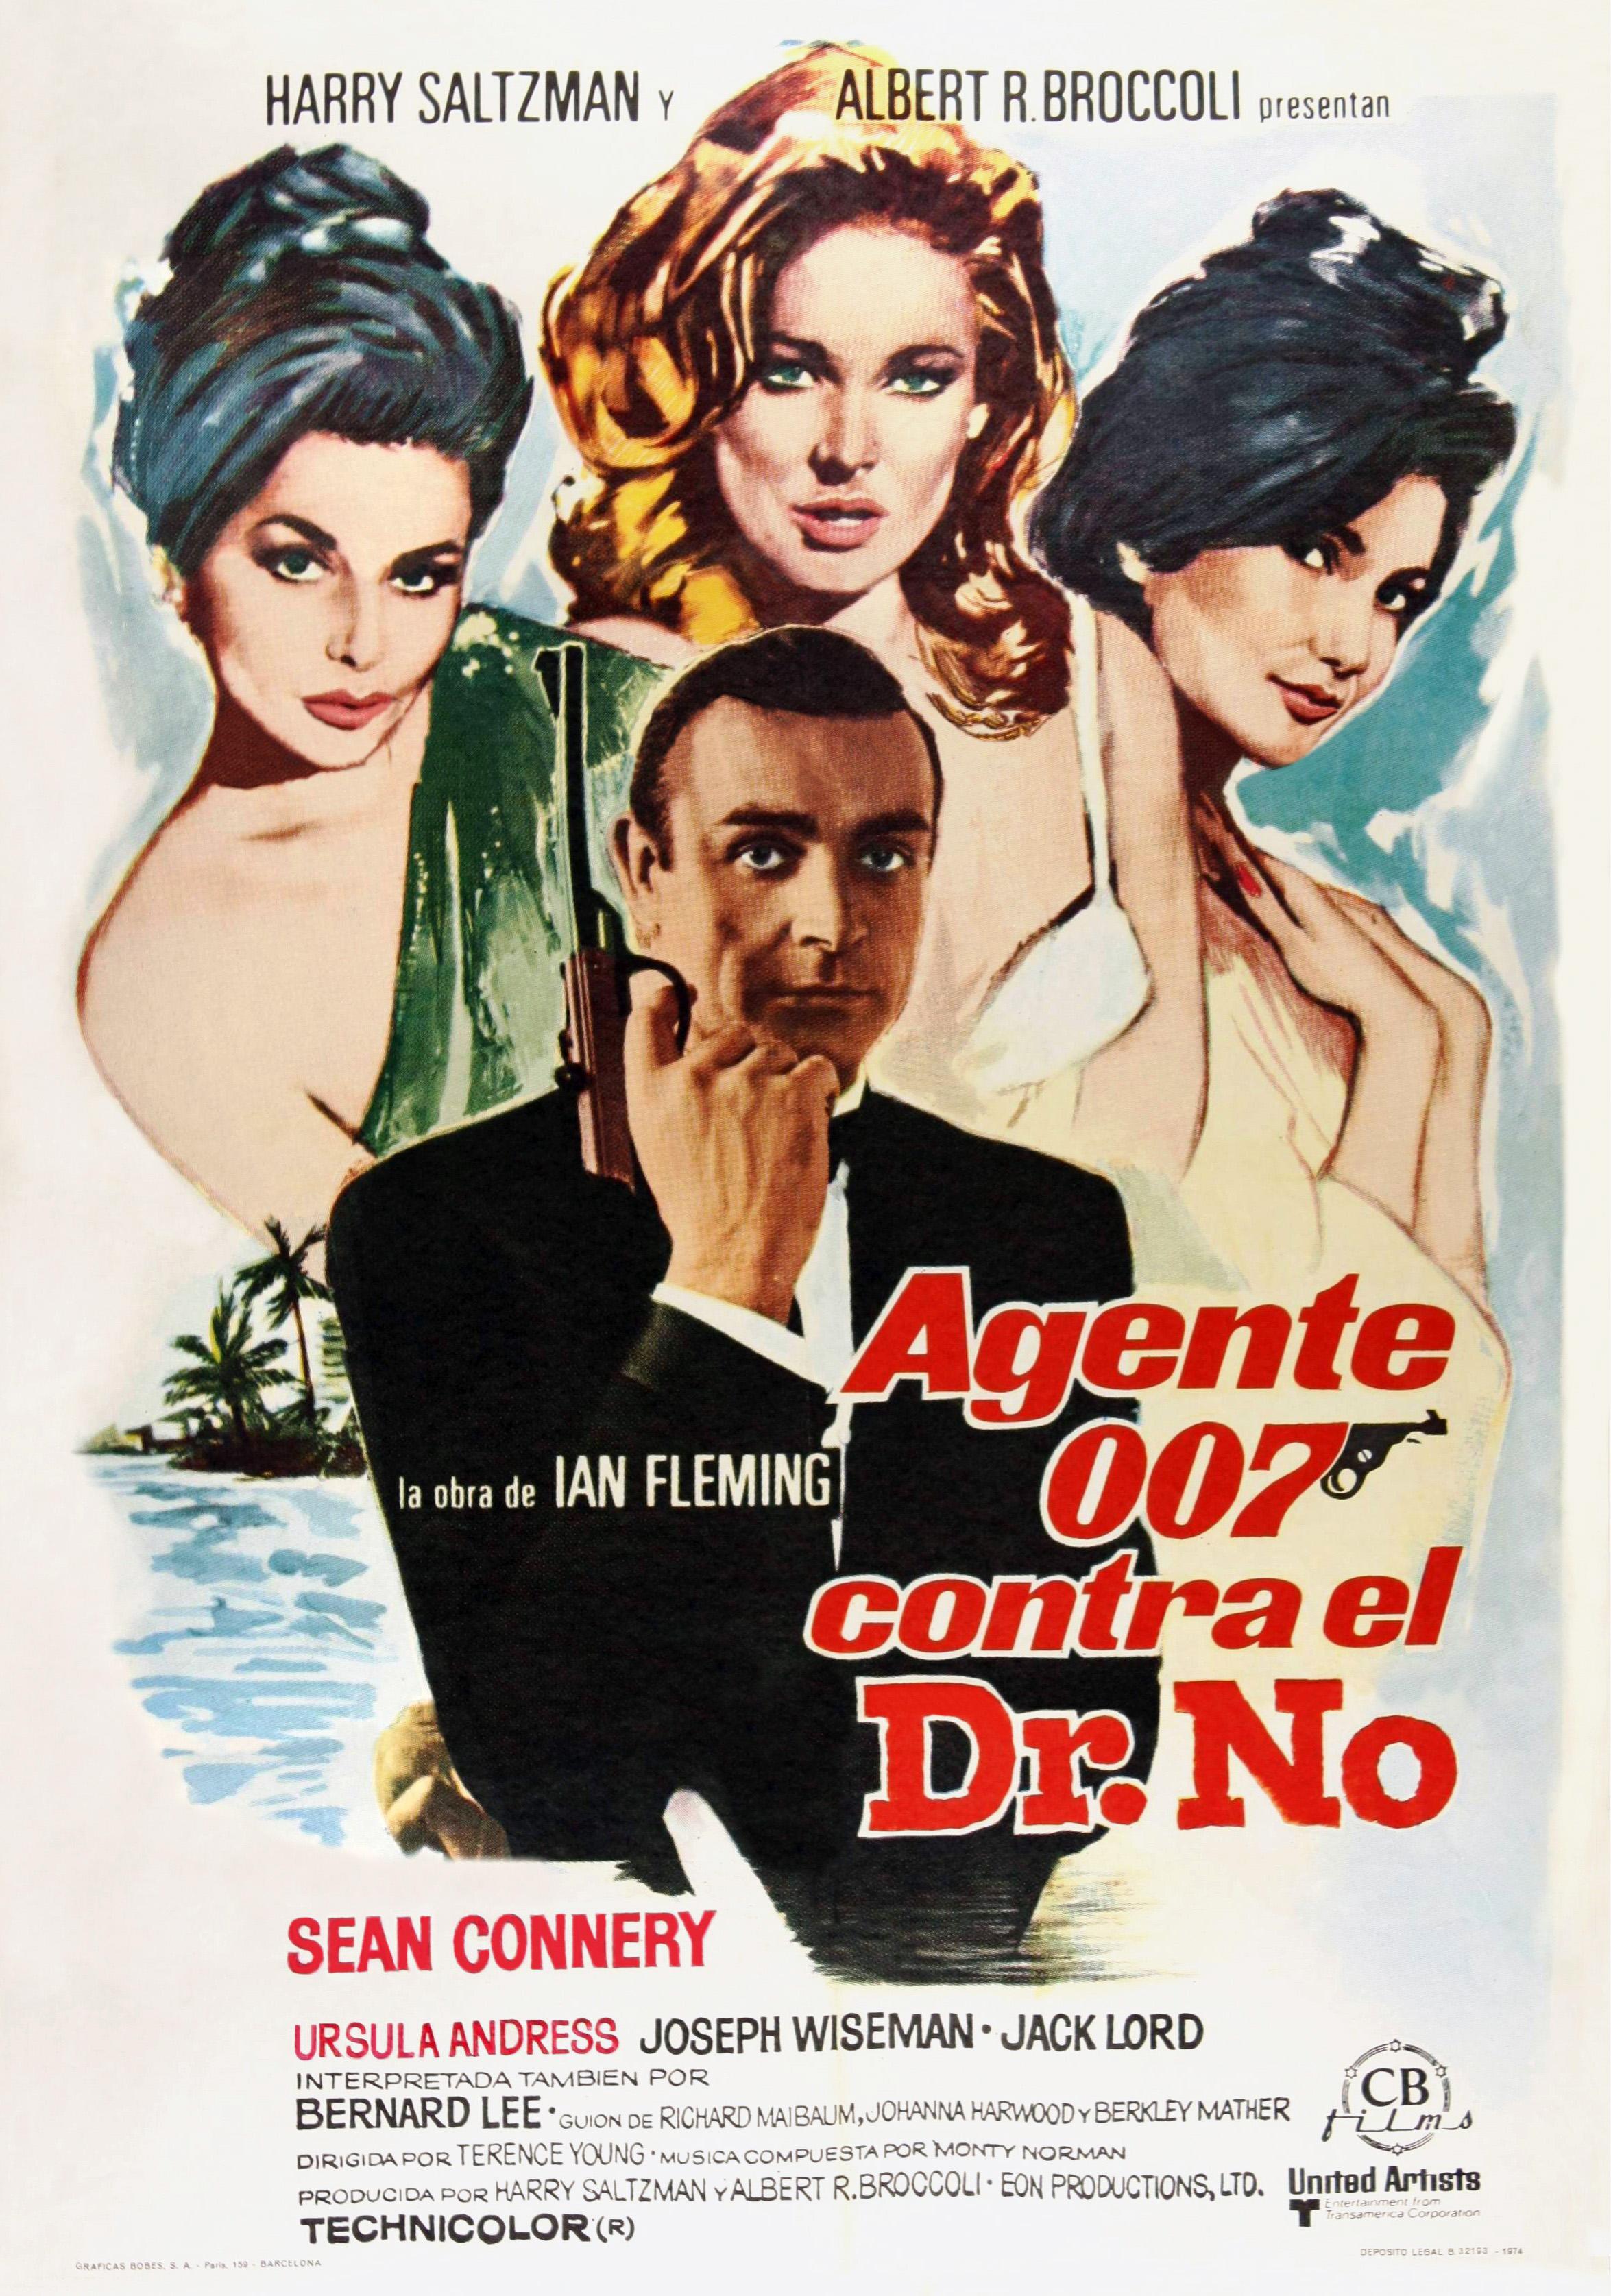 Sean Connery: Llega 007 para quedarse